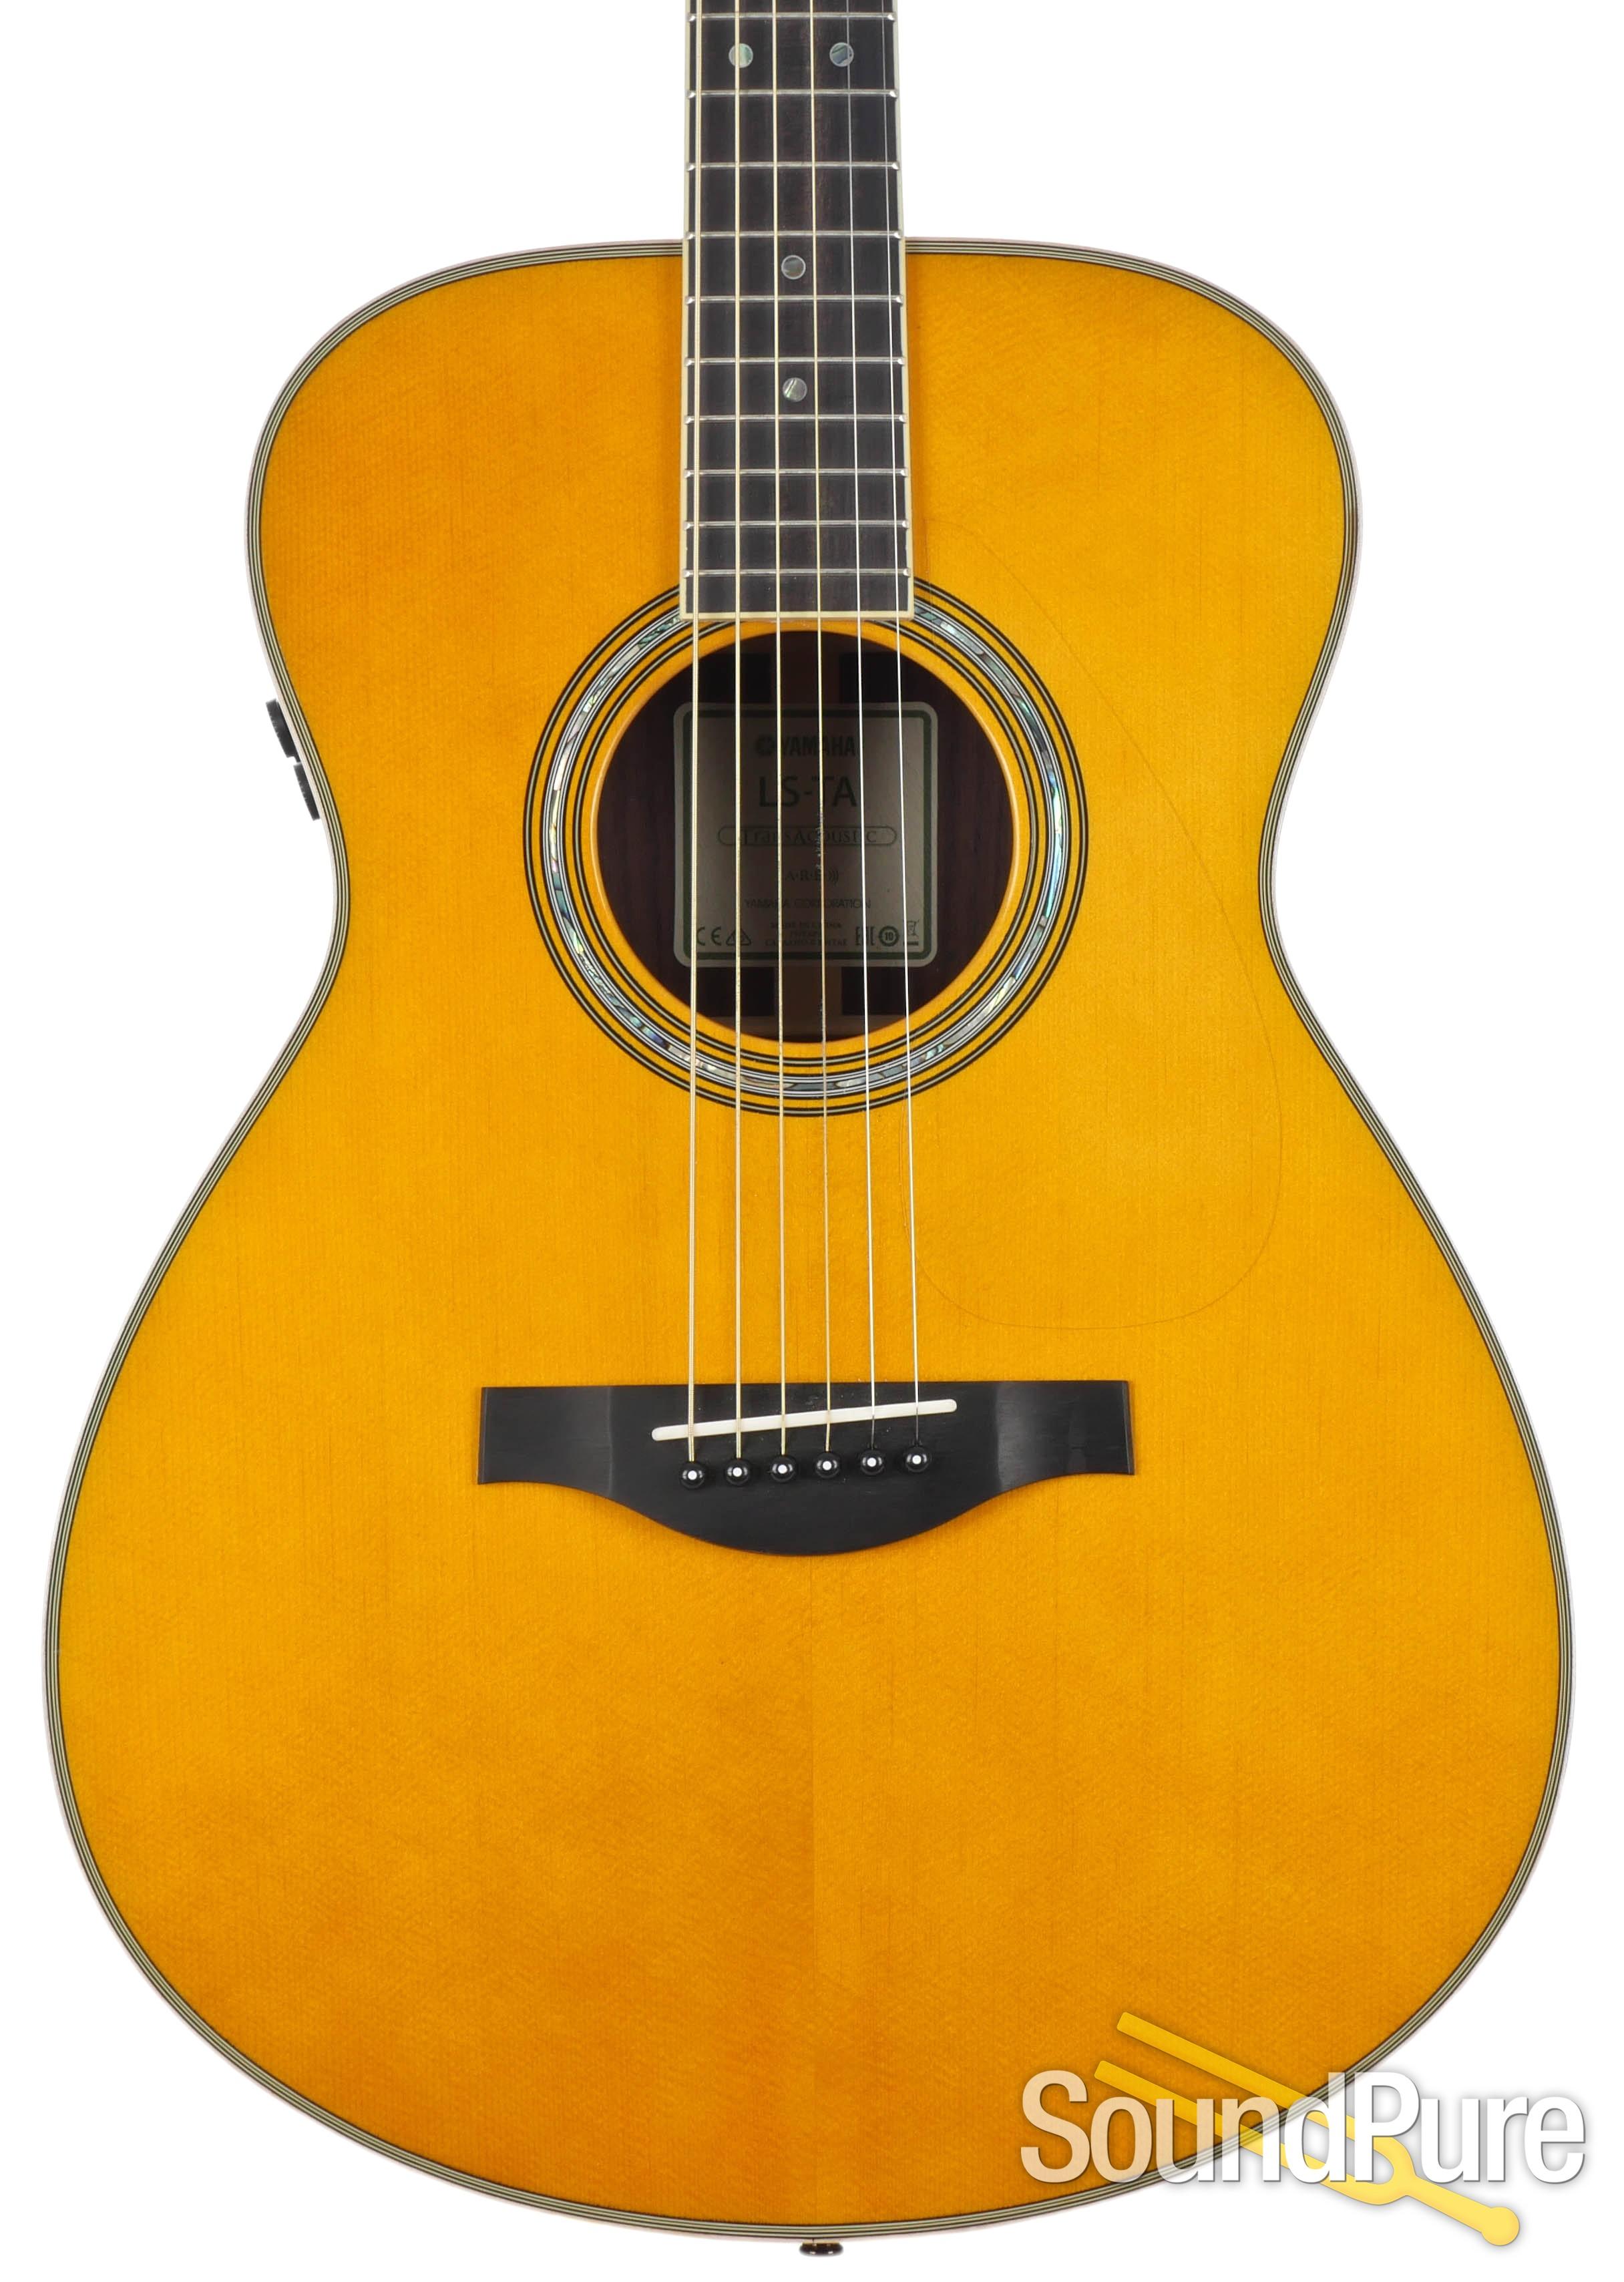 Yamaha ls ta acoustic guitar hm0220175 used for Yamaha ls ta